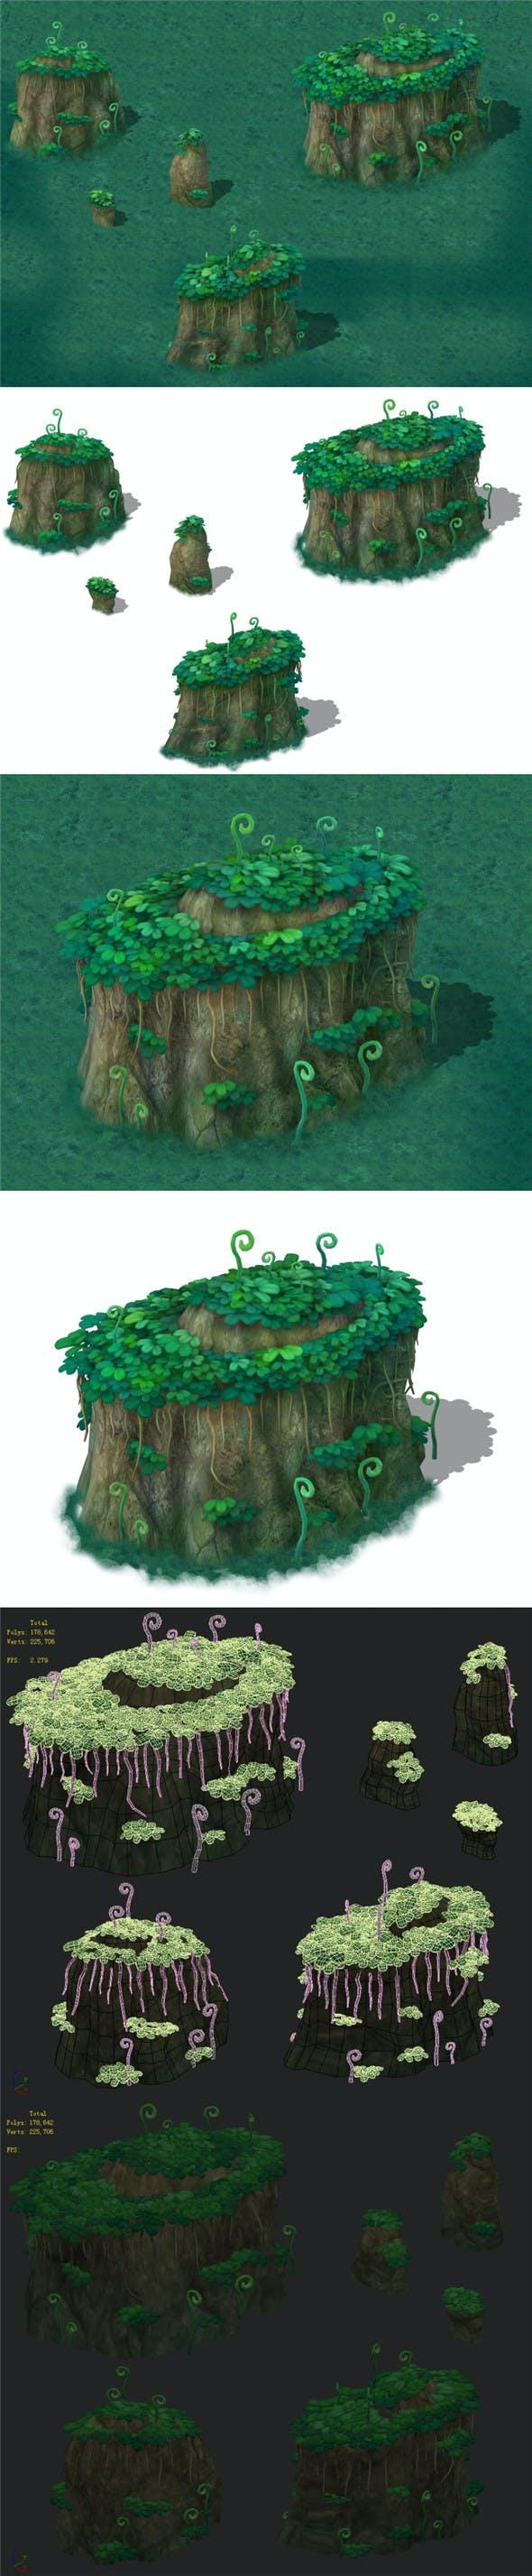 Cartoon version - spore forest terrain - 3DOcean Item for Sale